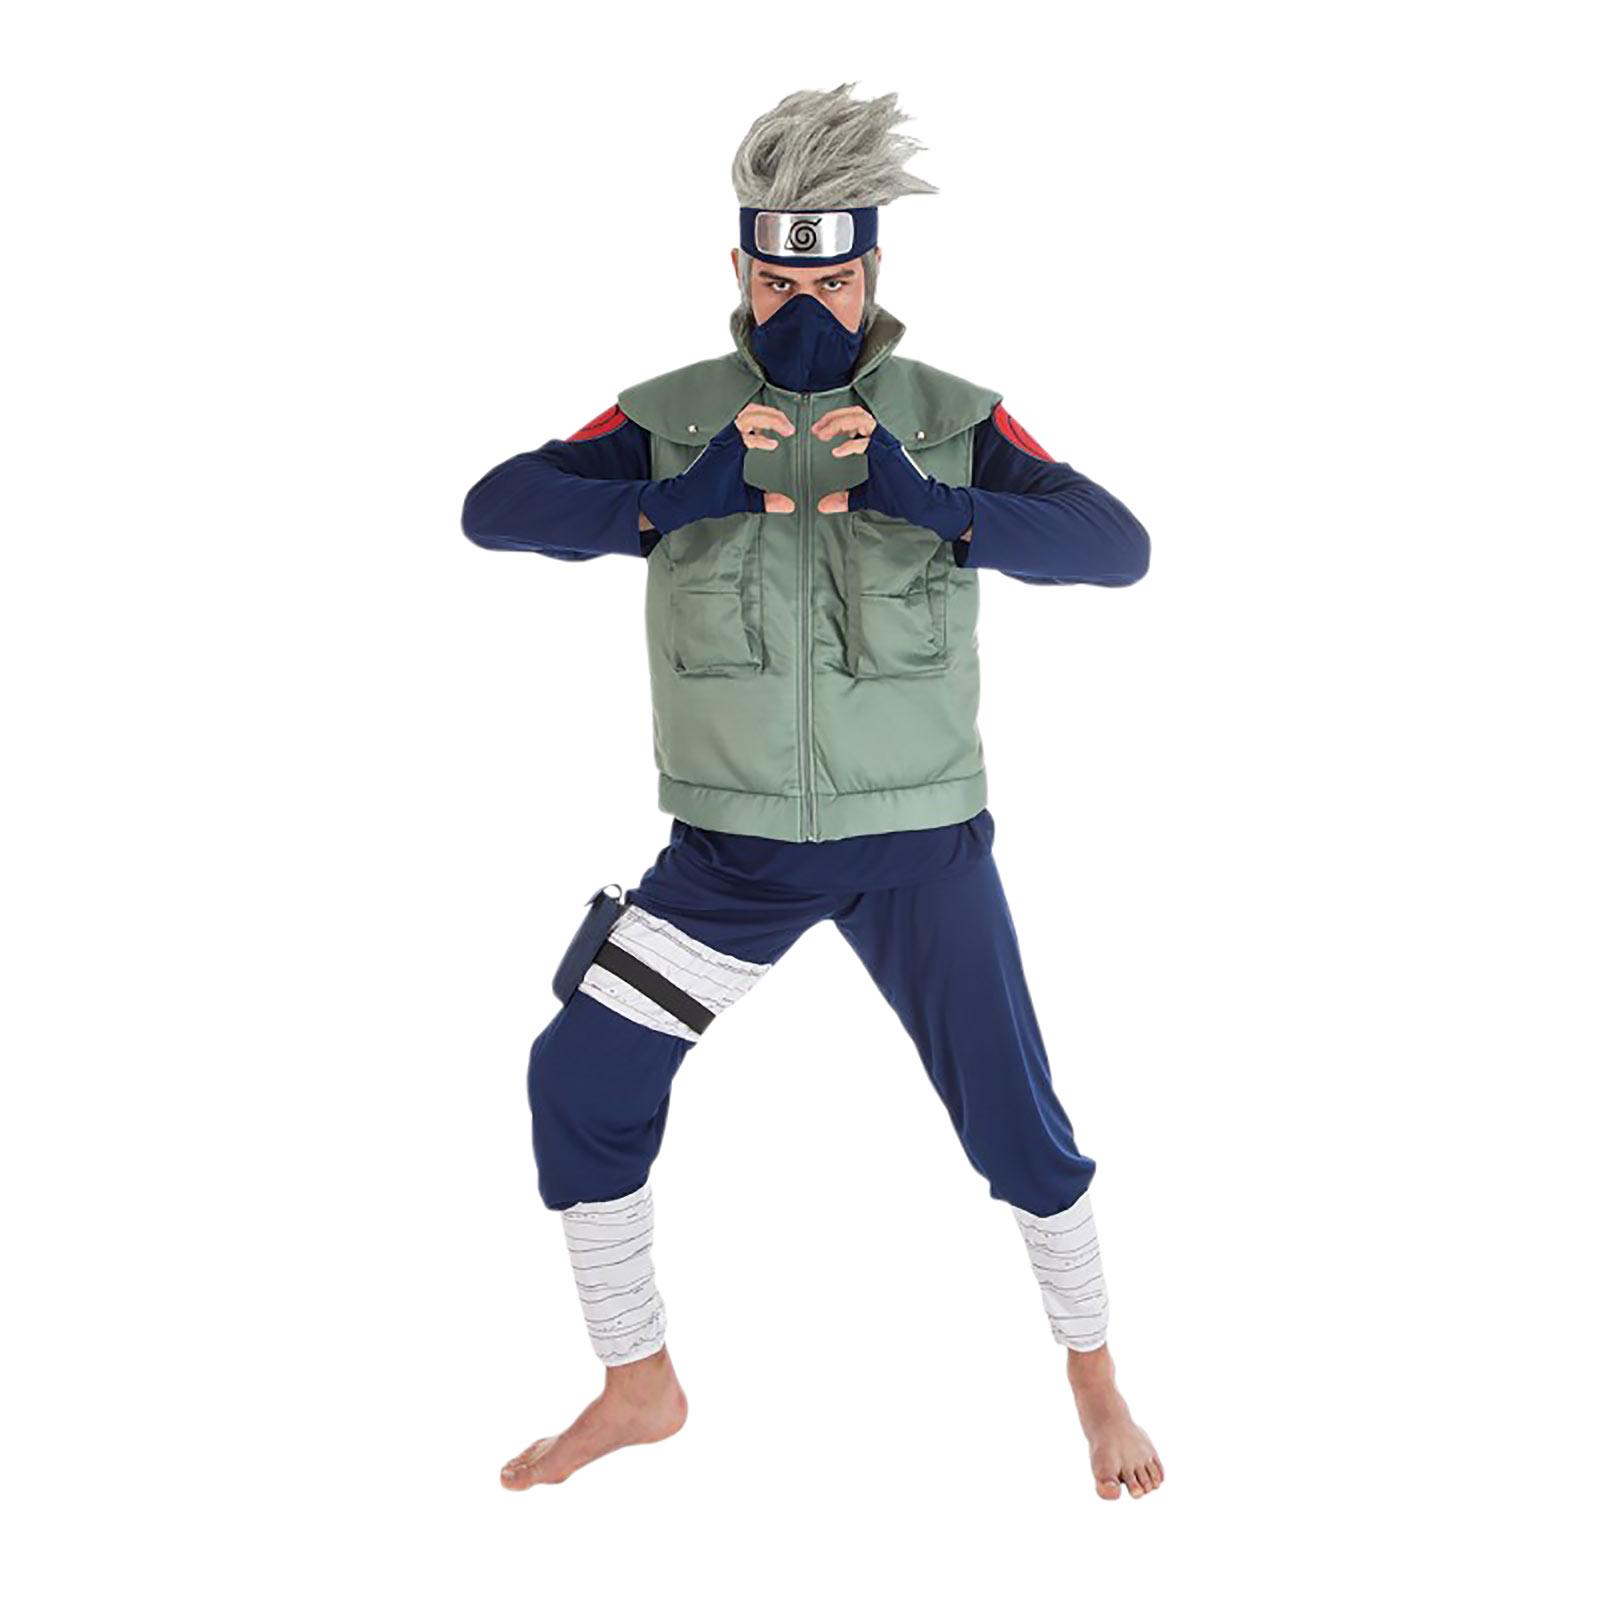 Naruto - Kakashi Hatake Kostüm für Erwachsene